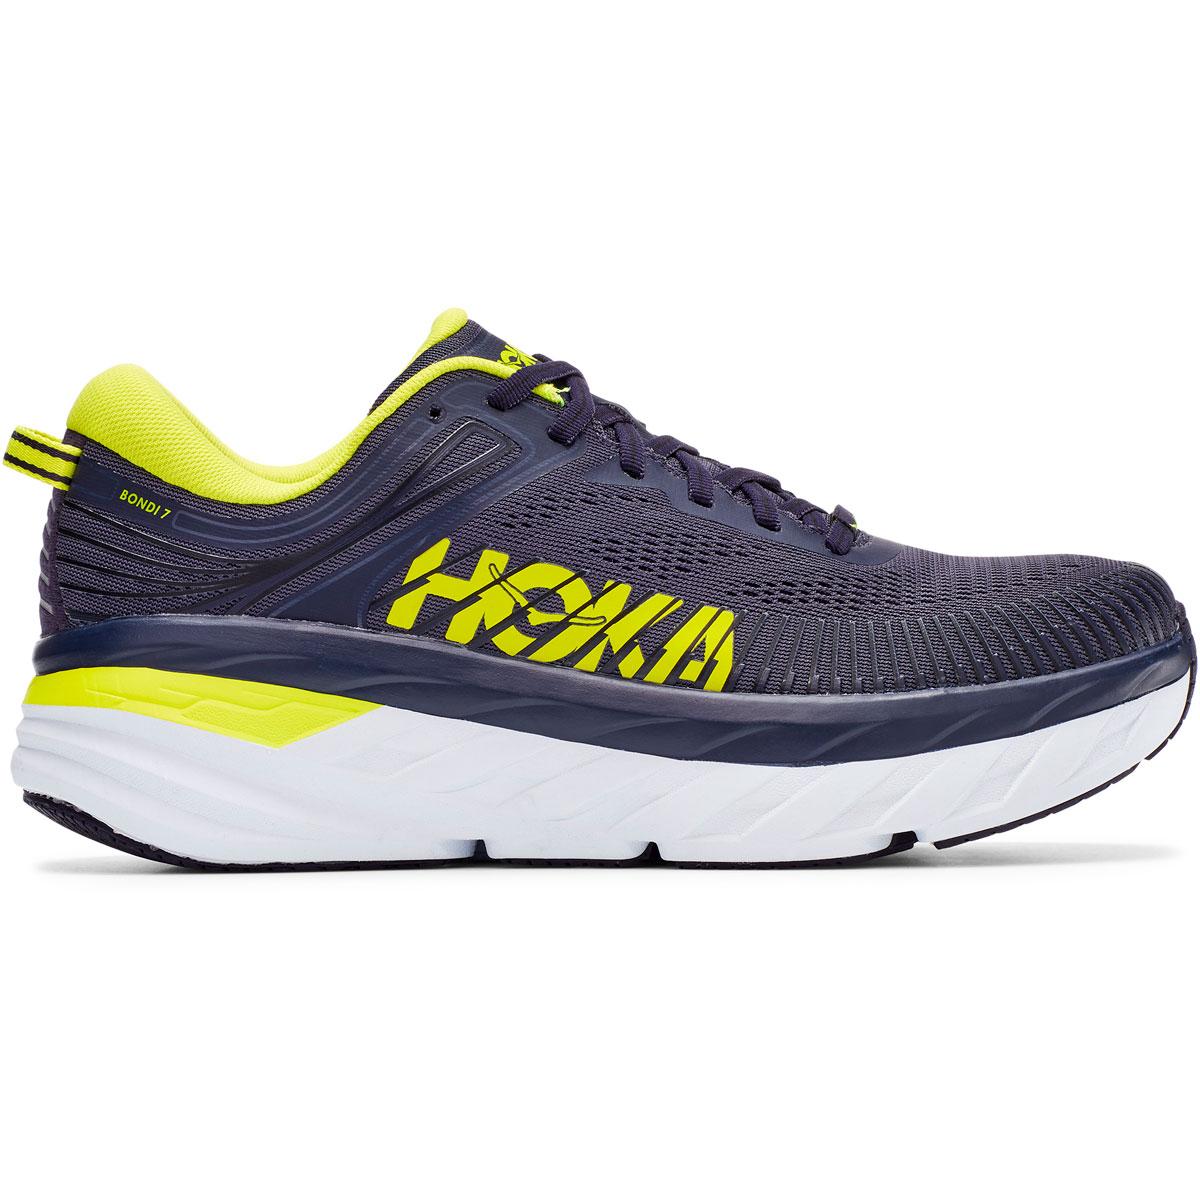 Men's Hoka One One Bondi 7 Running Shoe - Color: Odyssey Grey/Deep Well - Size: 7 - Width: Regular, Odyssey Grey/Deep Well, large, image 1